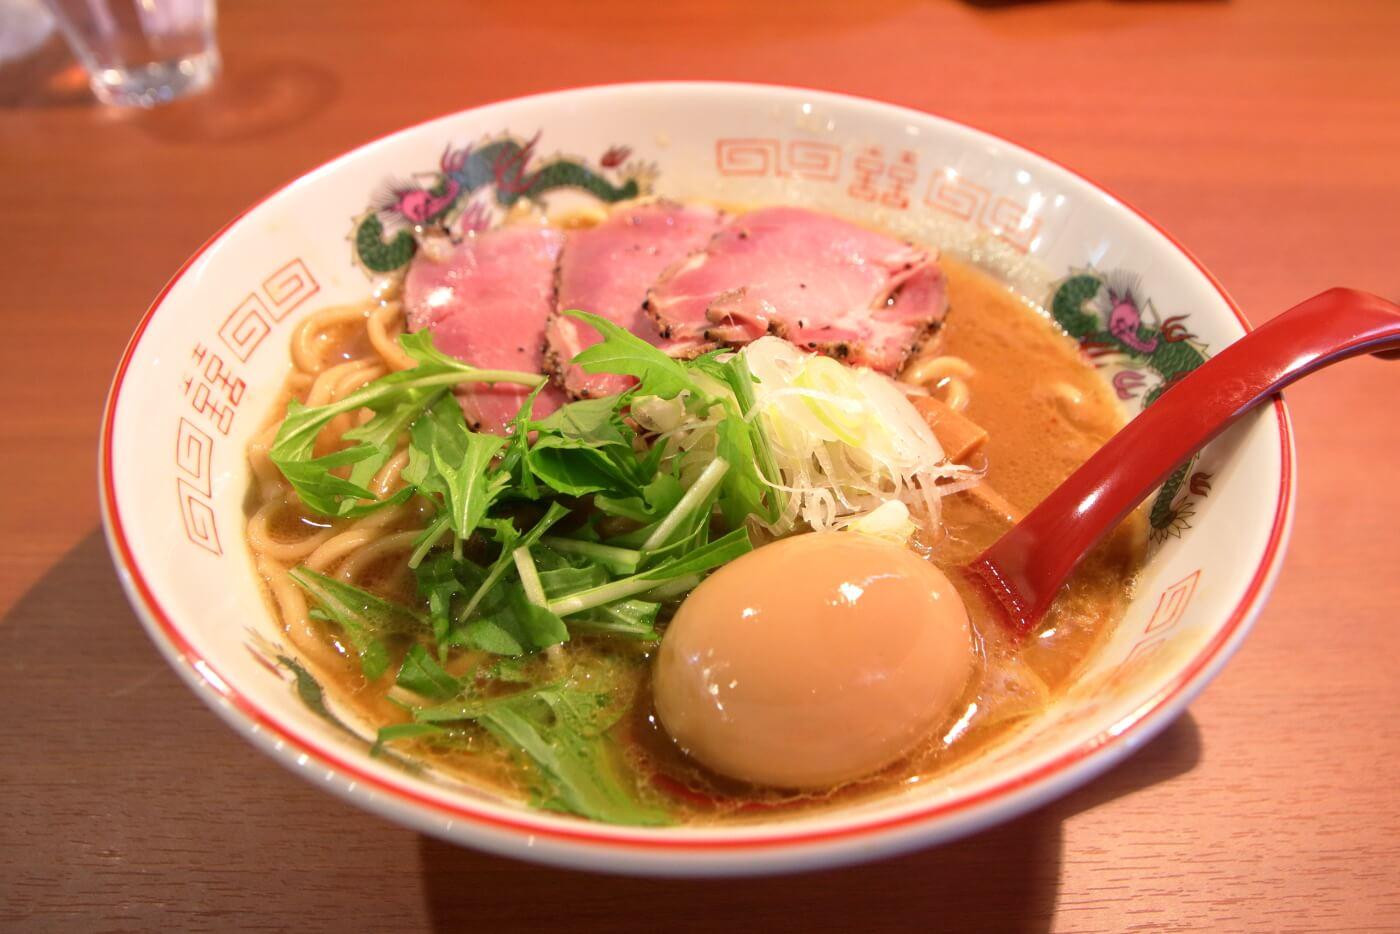 製麺処蔵木南国店 特製濃厚魚介豚骨ラーメン太麺